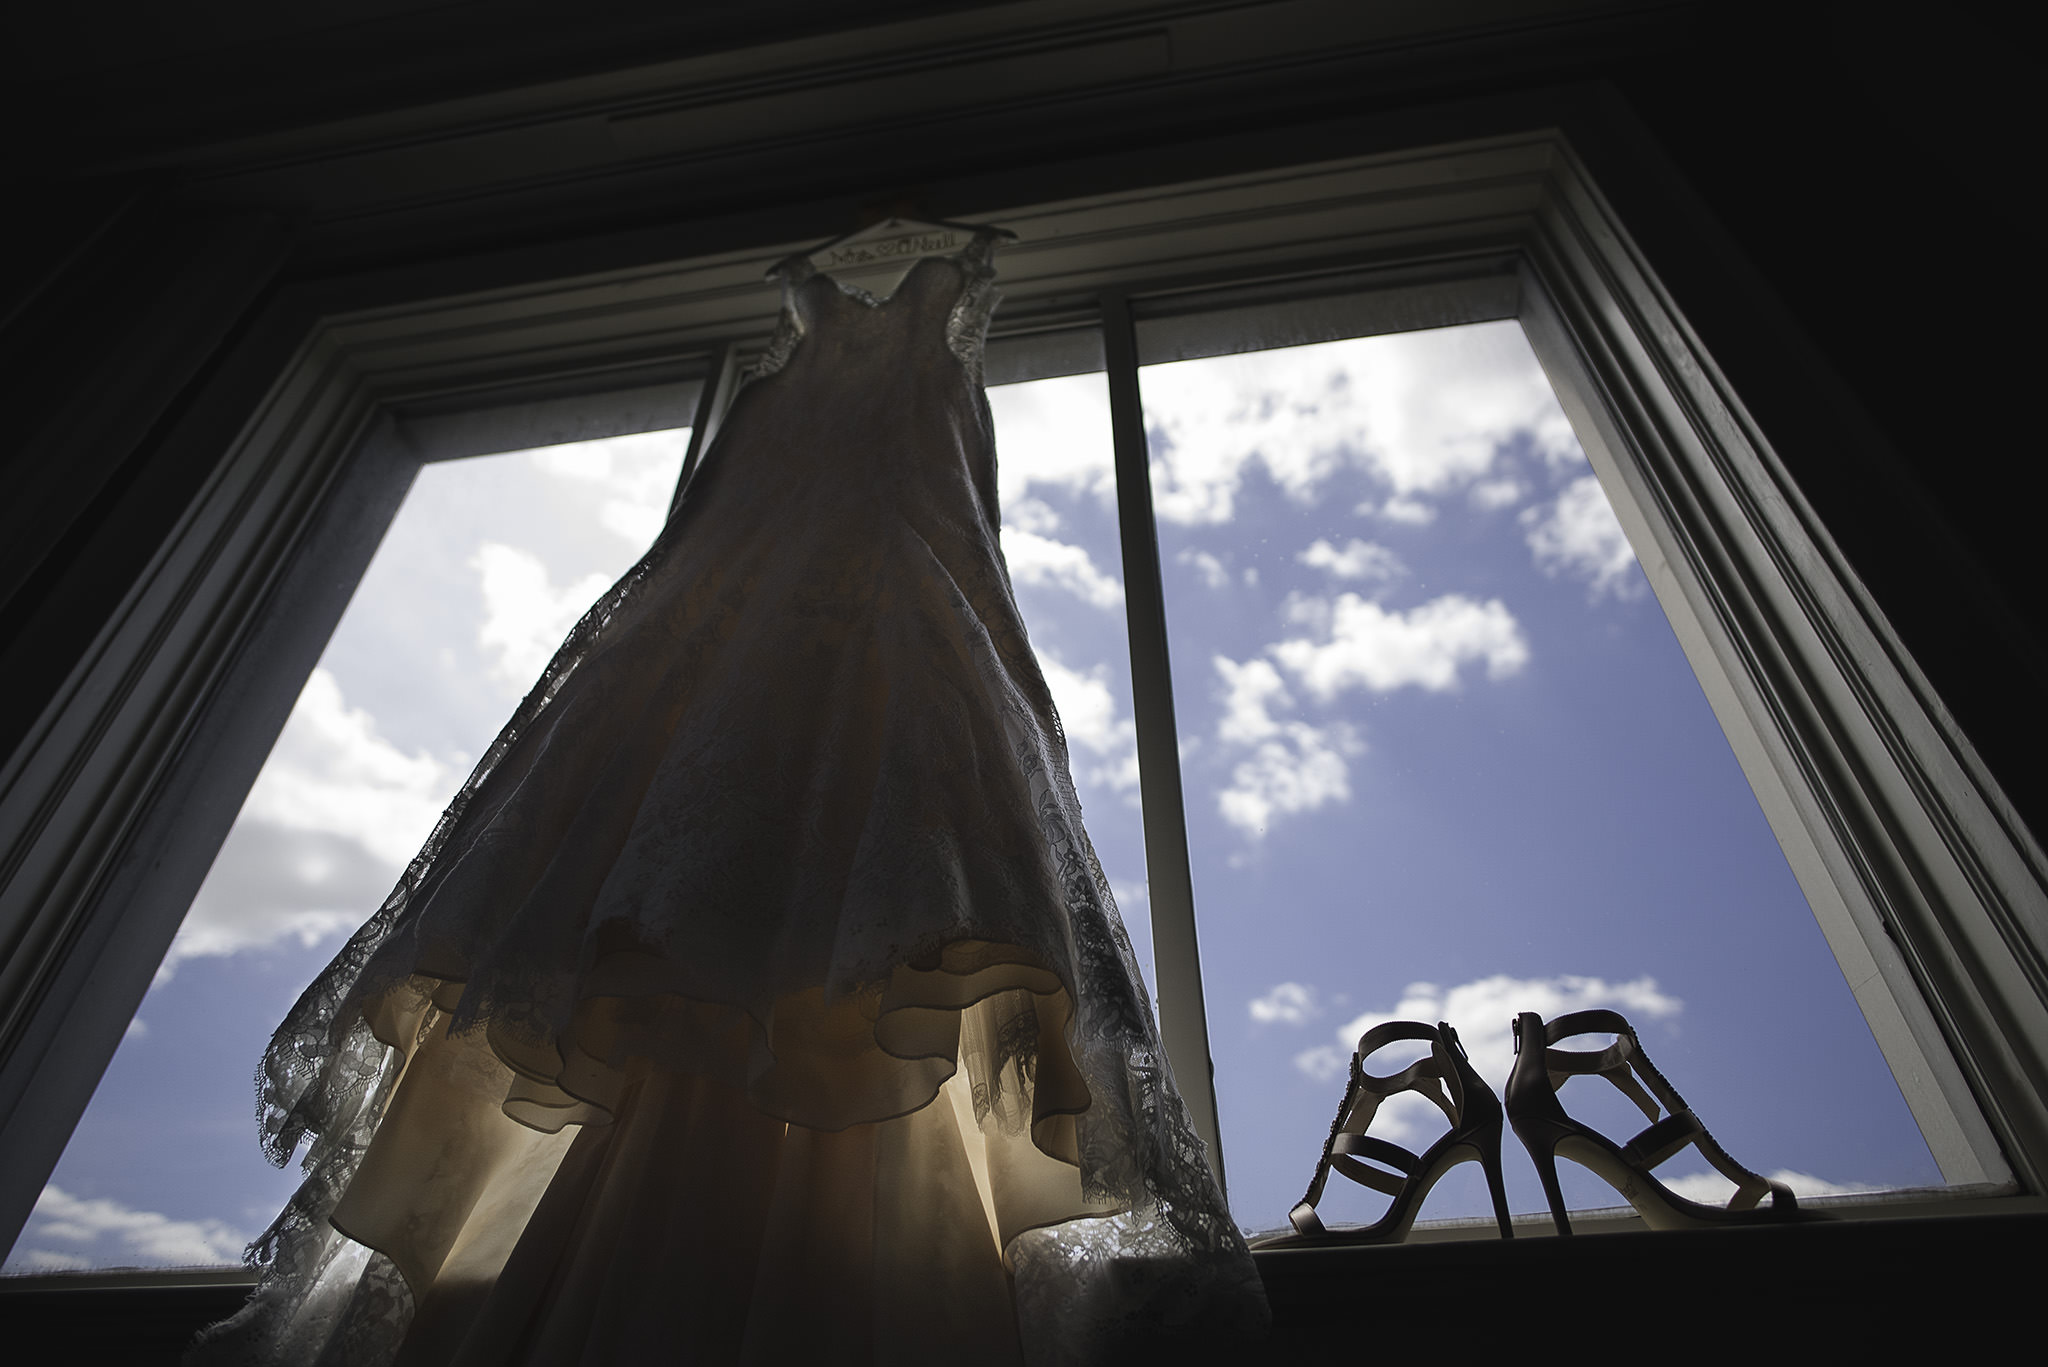 Mia-Bella-Vita-Hotel-Zaza-classy-lifestyle-modern-wedding-photographer